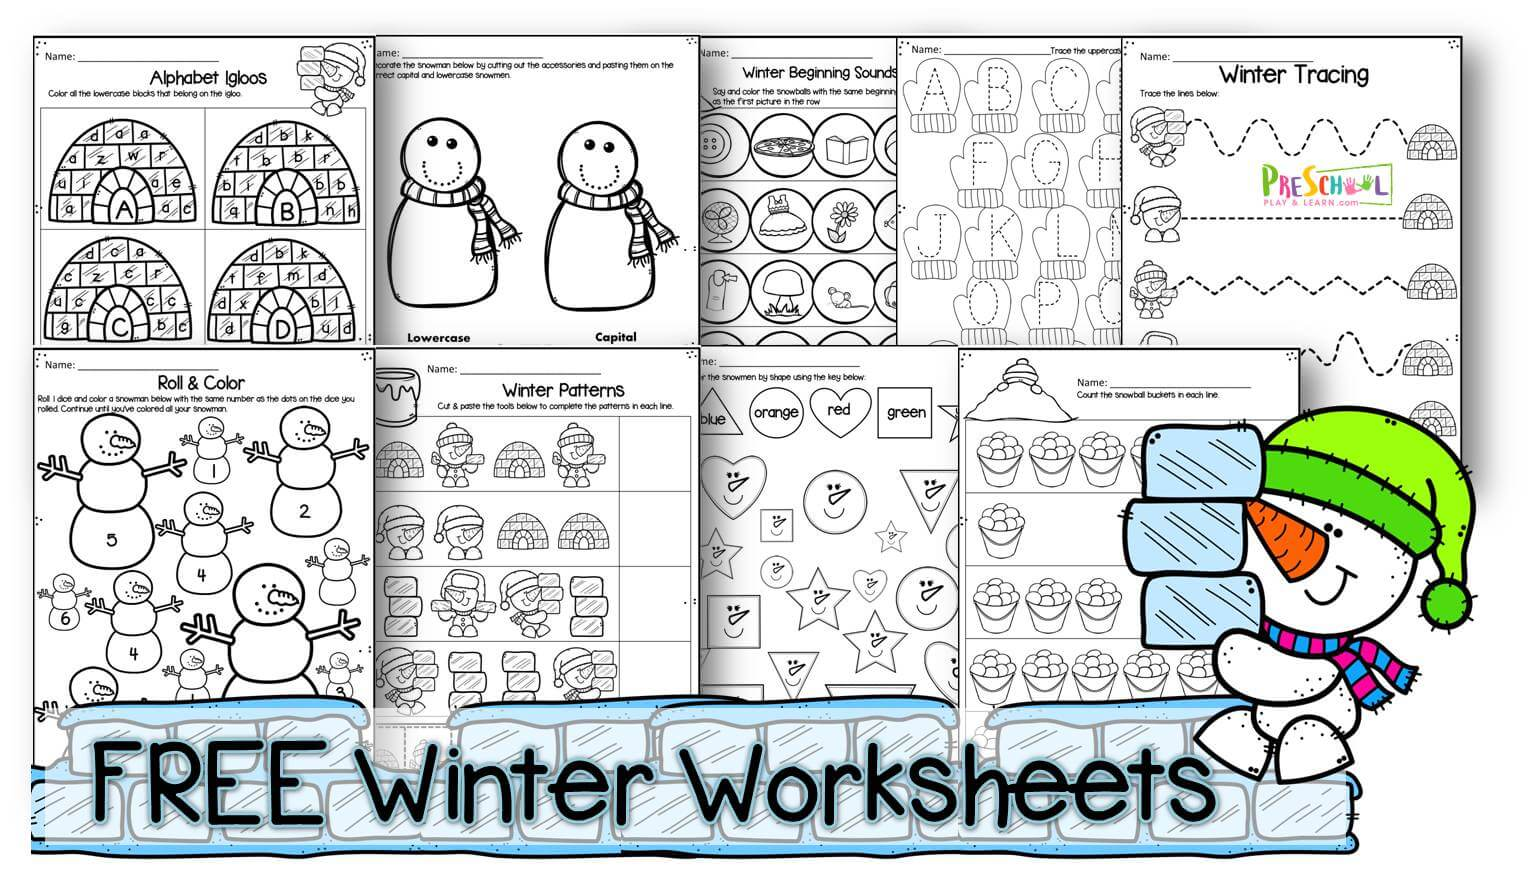 FREE Winter Worksheets for Preschoolers